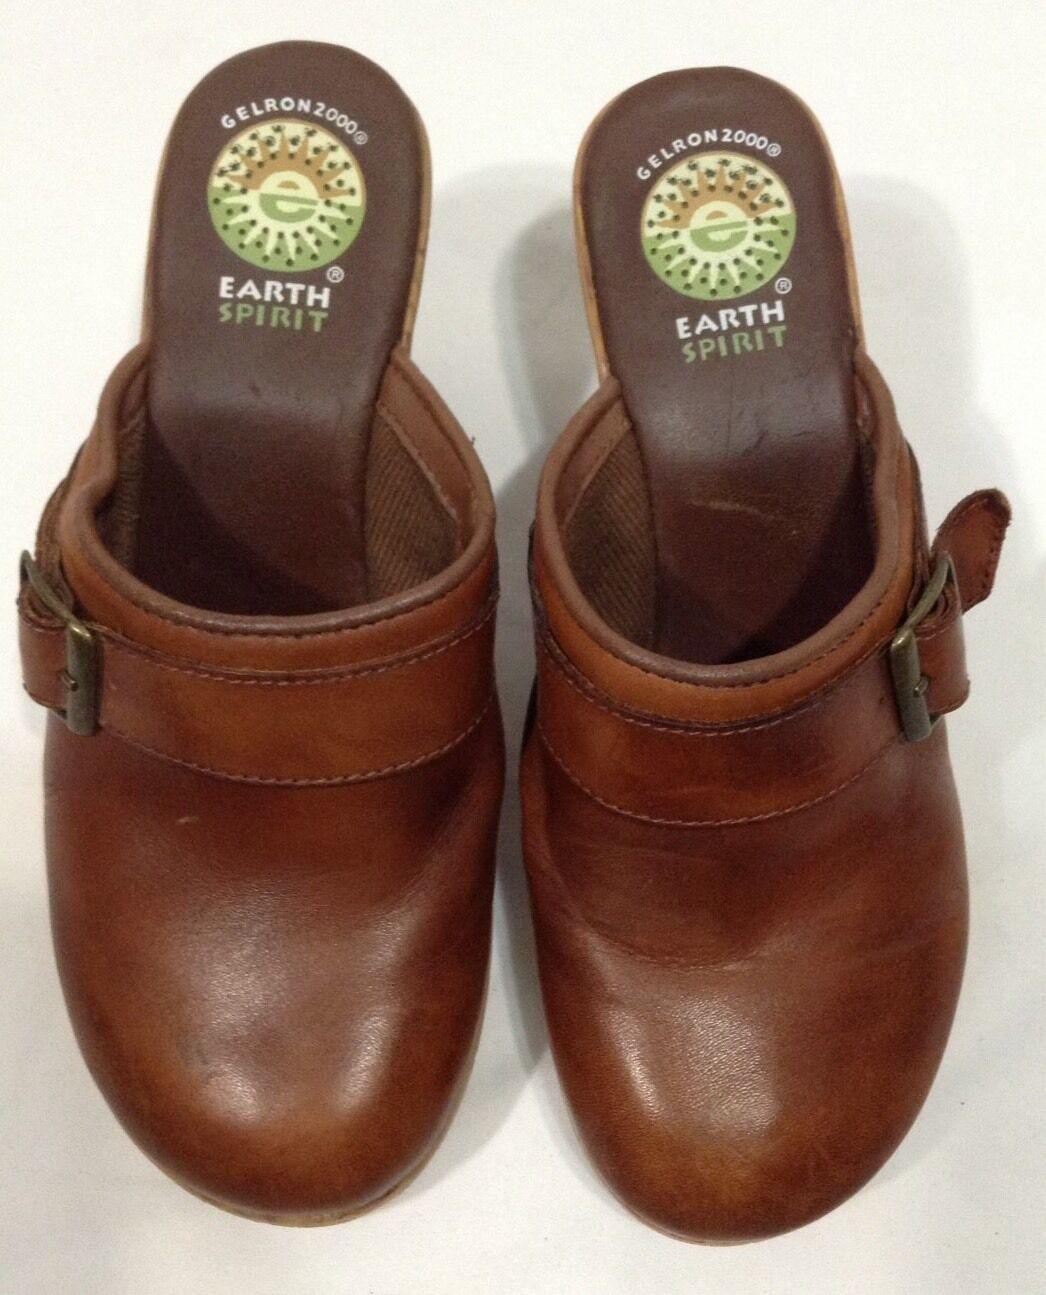 la terre esprit cuir emma feuillet de cuir esprit brun sur mules talons de chaussures sz 6 def9a8